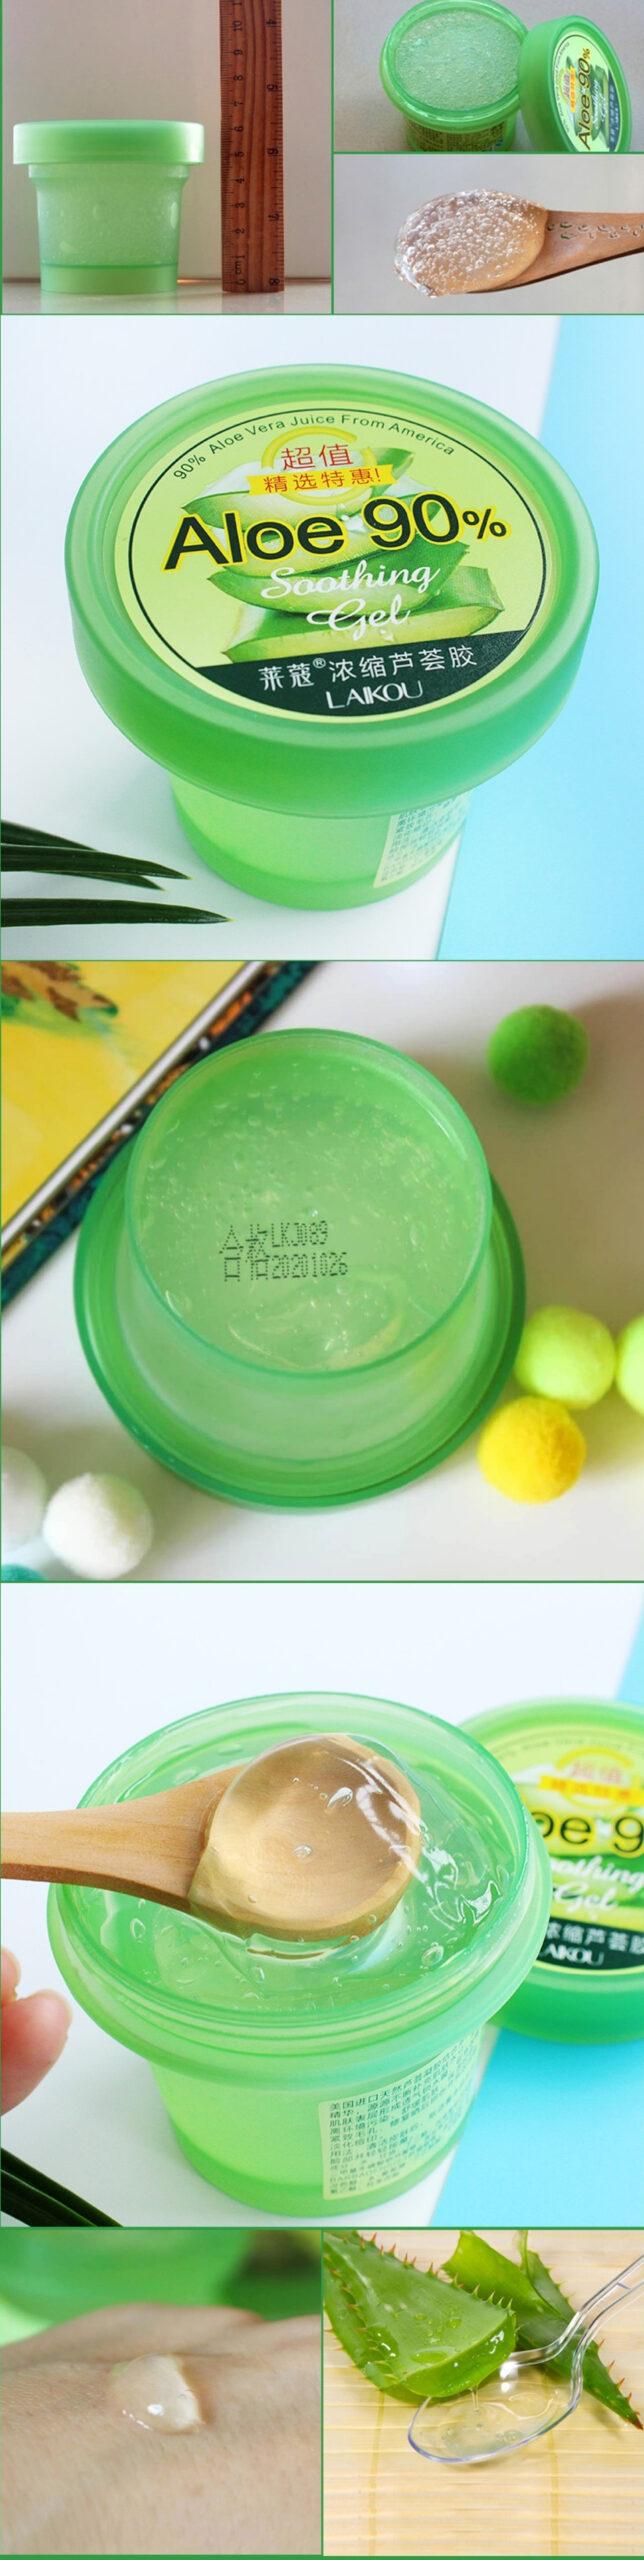 Wrinkle Removal Moisturizing Natural Aloe Vera Face Gel